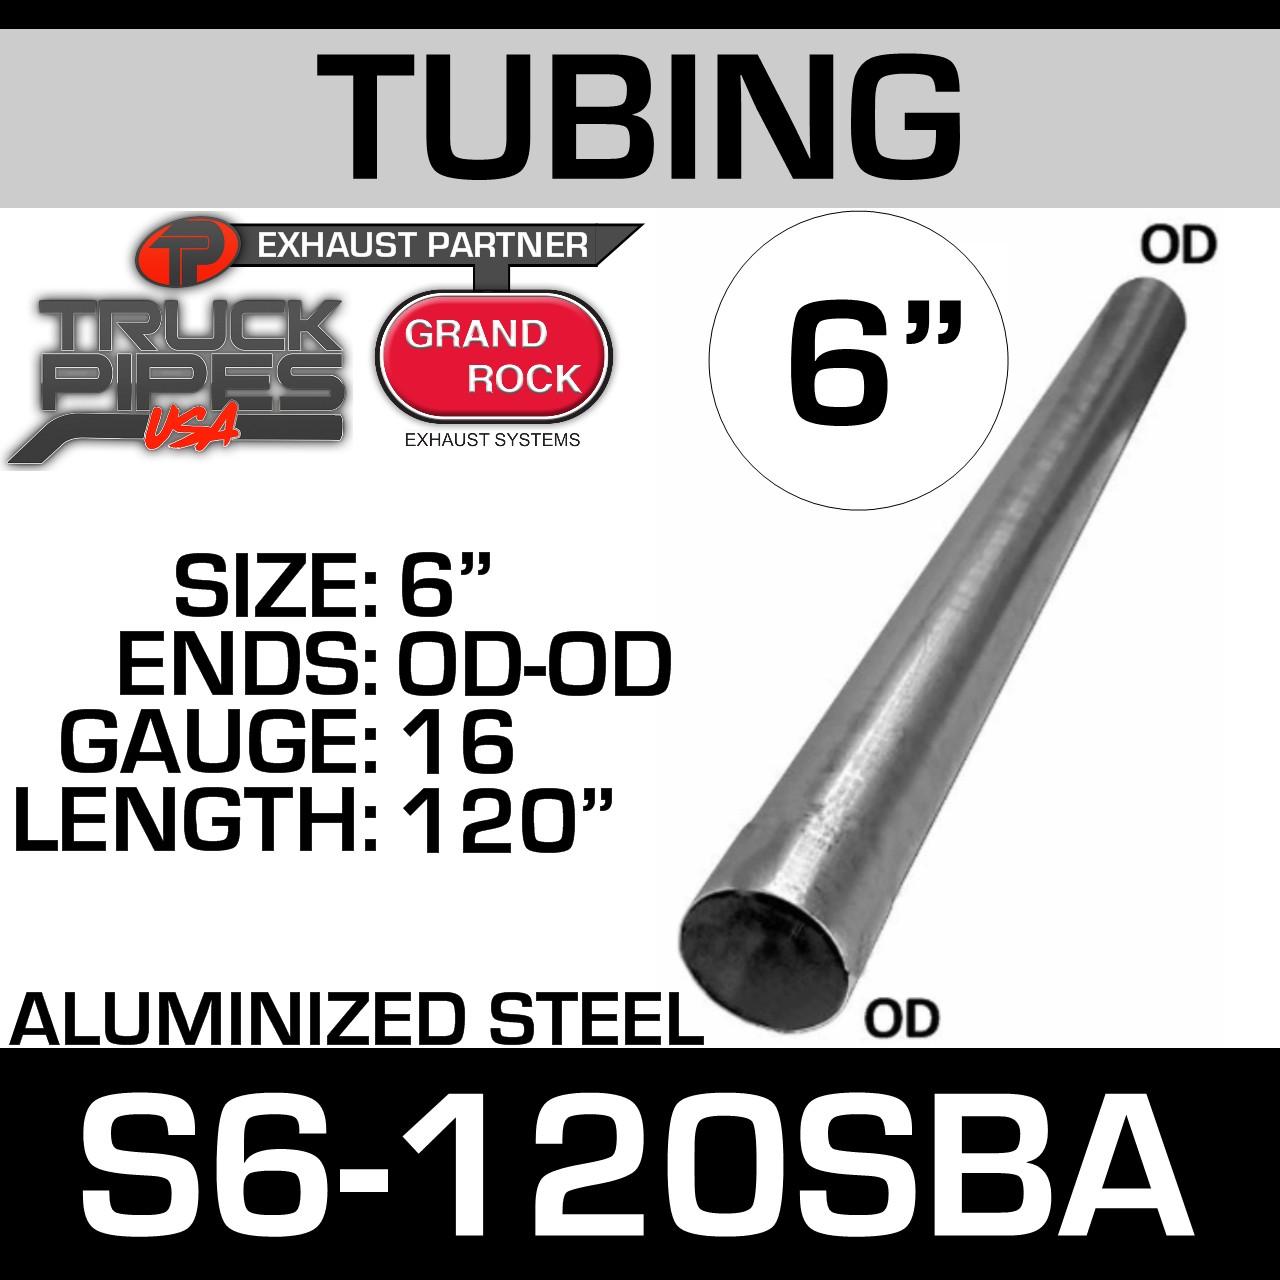 s6-120sba-aluminized-steel-exhaust-tubing-6-inch-diameter-od-end-120-inches-long.jpg